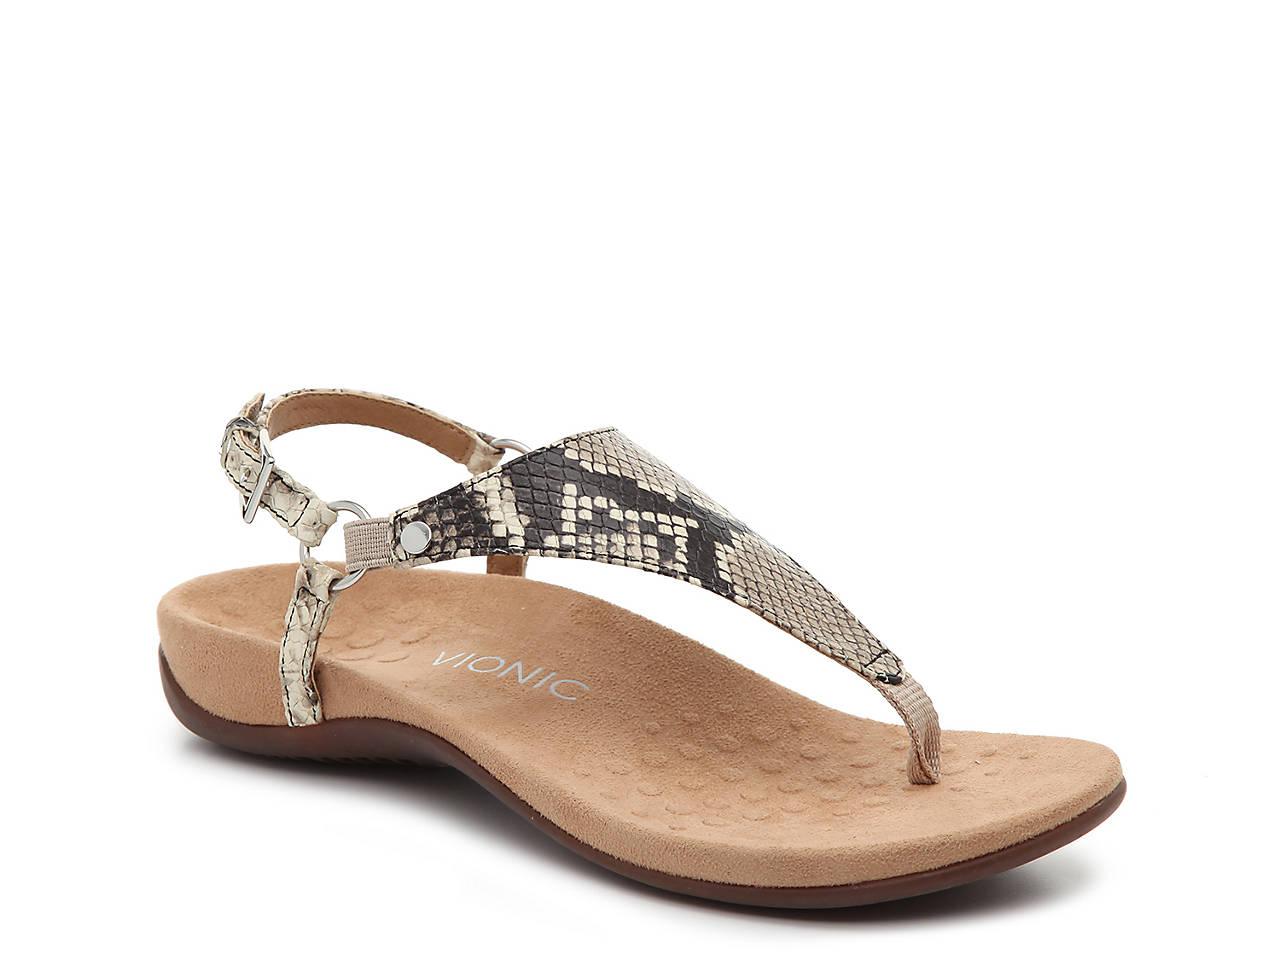 efde623c3497 Vionic Kirra Sandal Women s Shoes